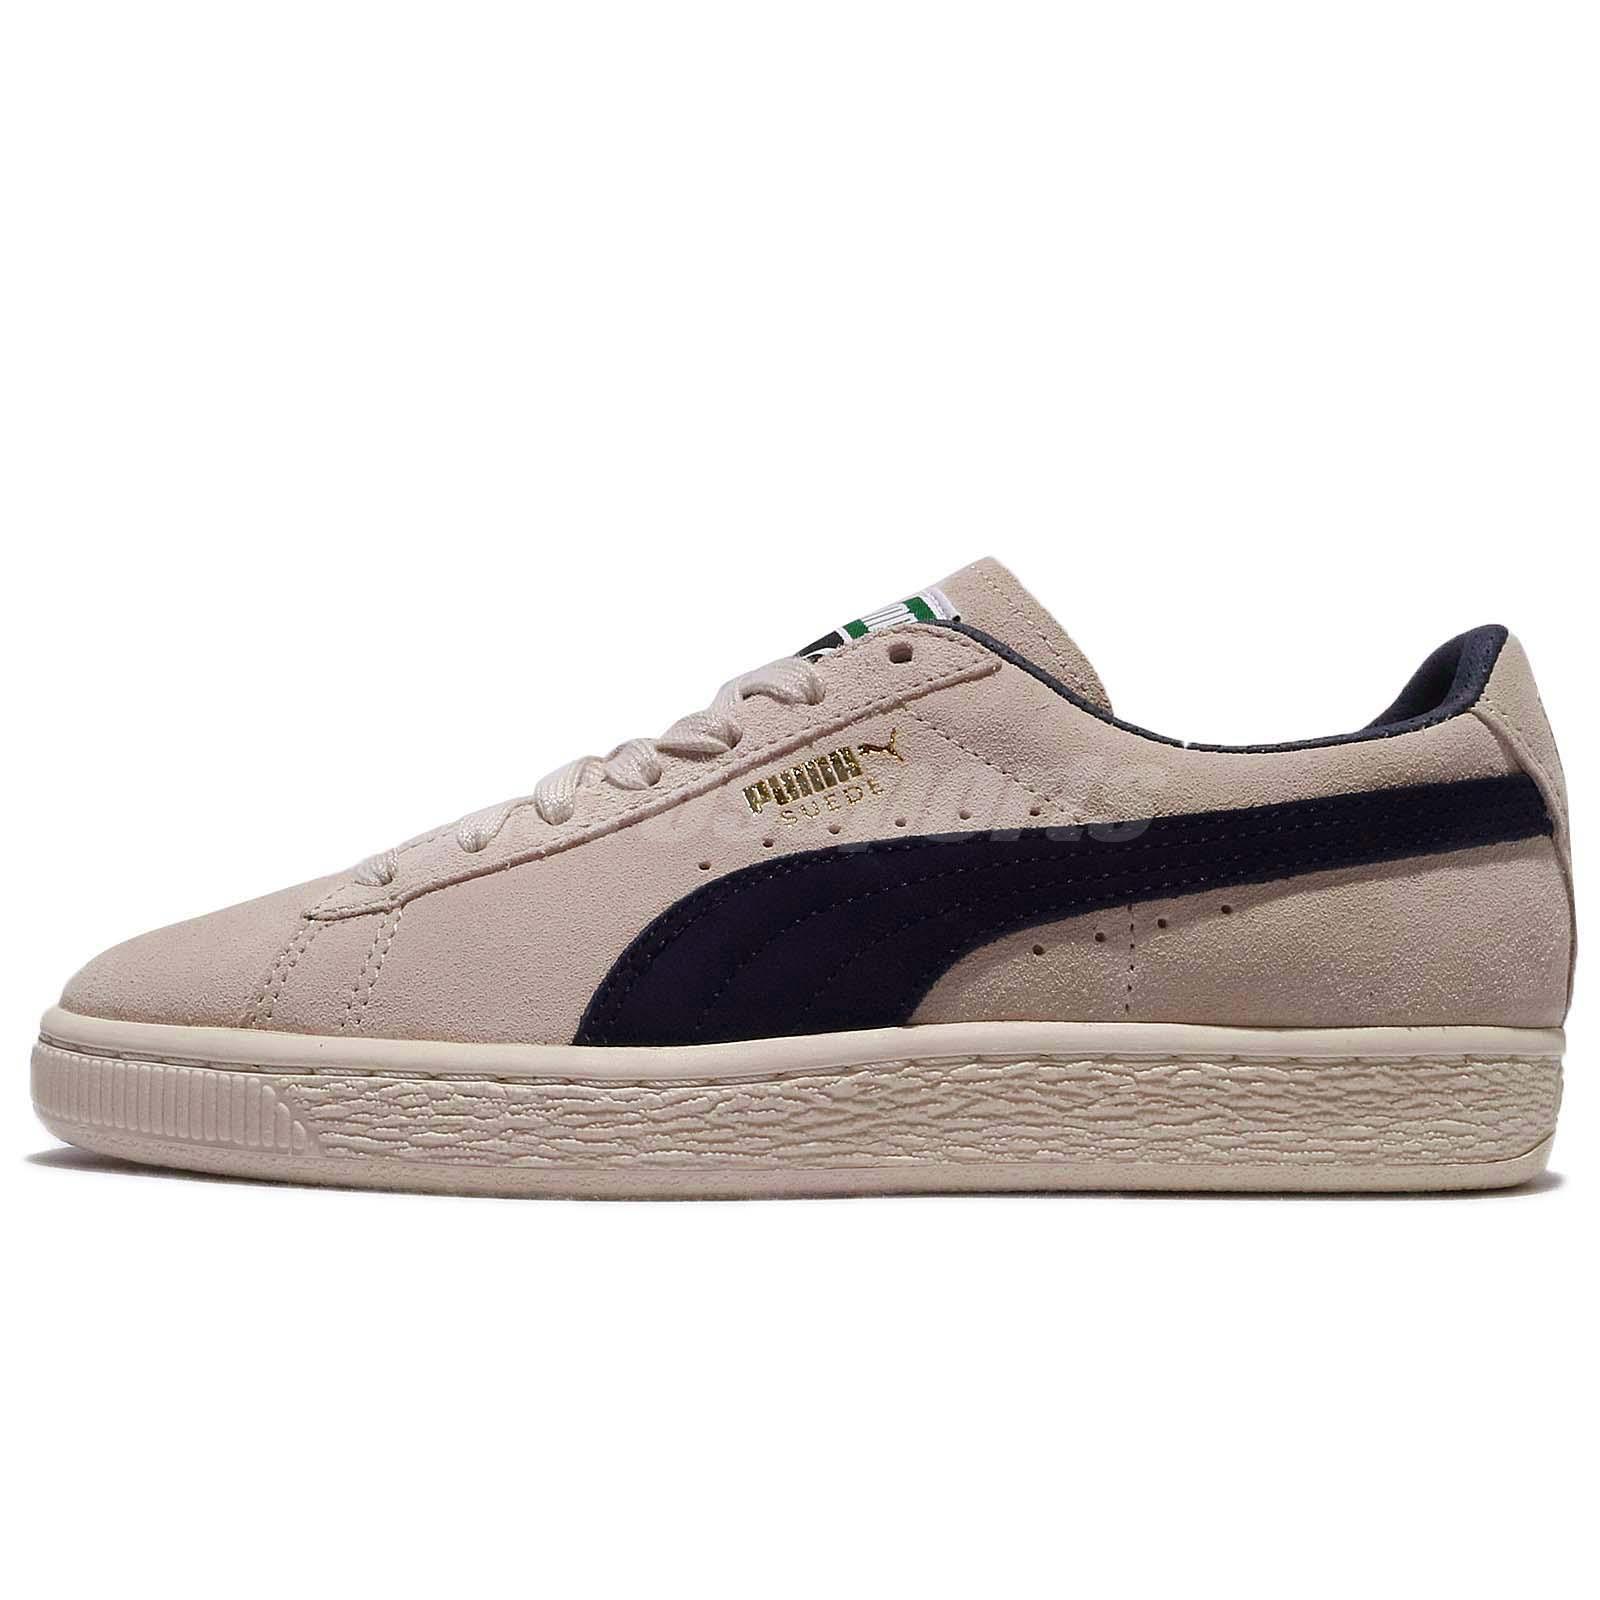 Puma Suede Classic Archive Low Birch Peacoat Men Shoes Sneakers 365587-02 8348aa072daa